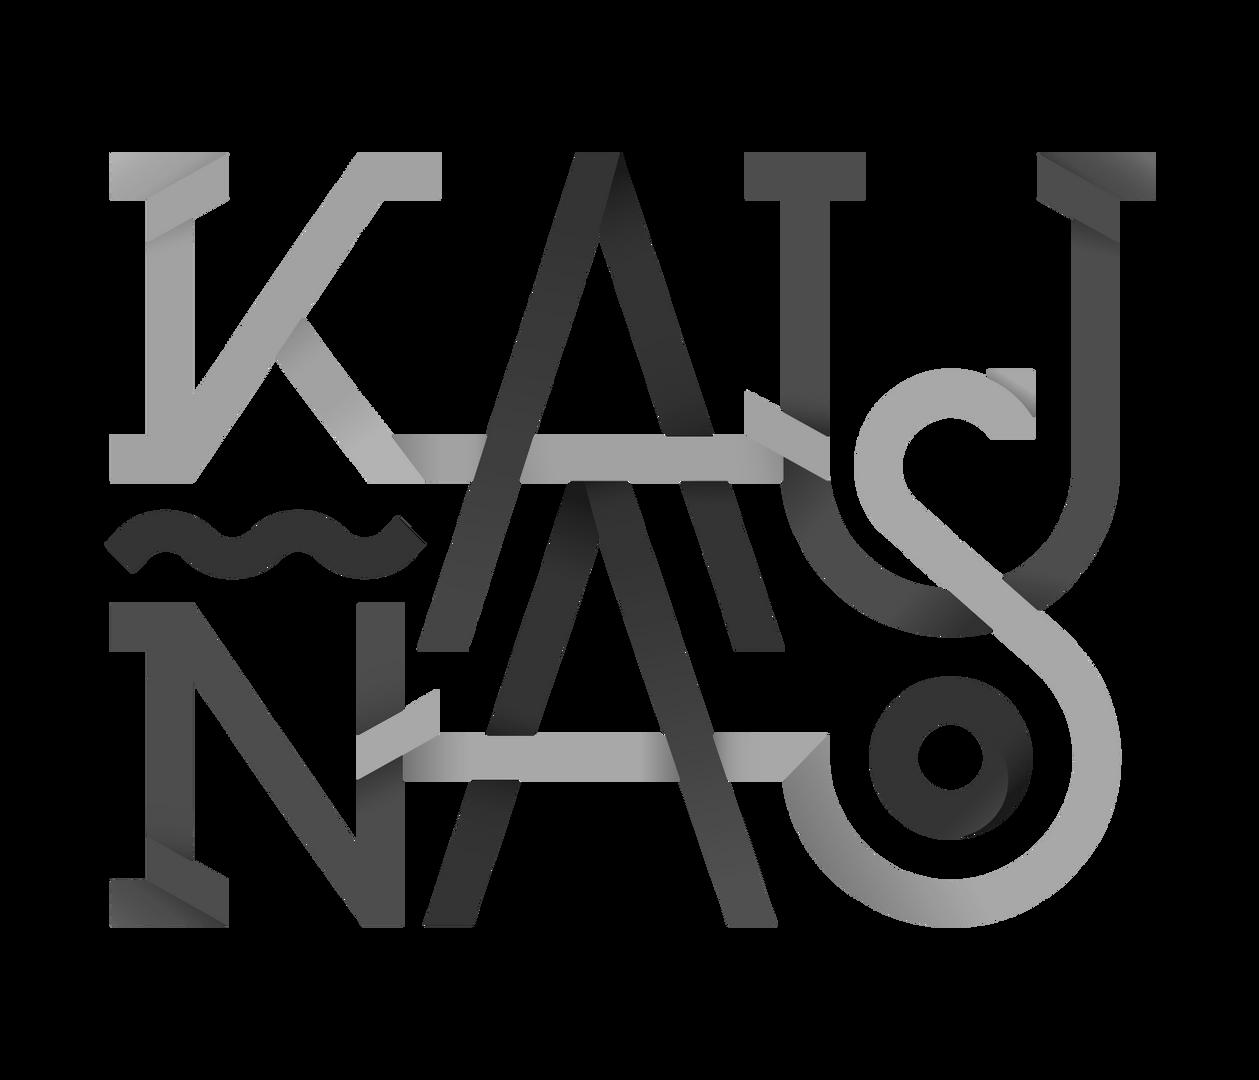 INICIATYVOS-KAUNAS-LOGO.png